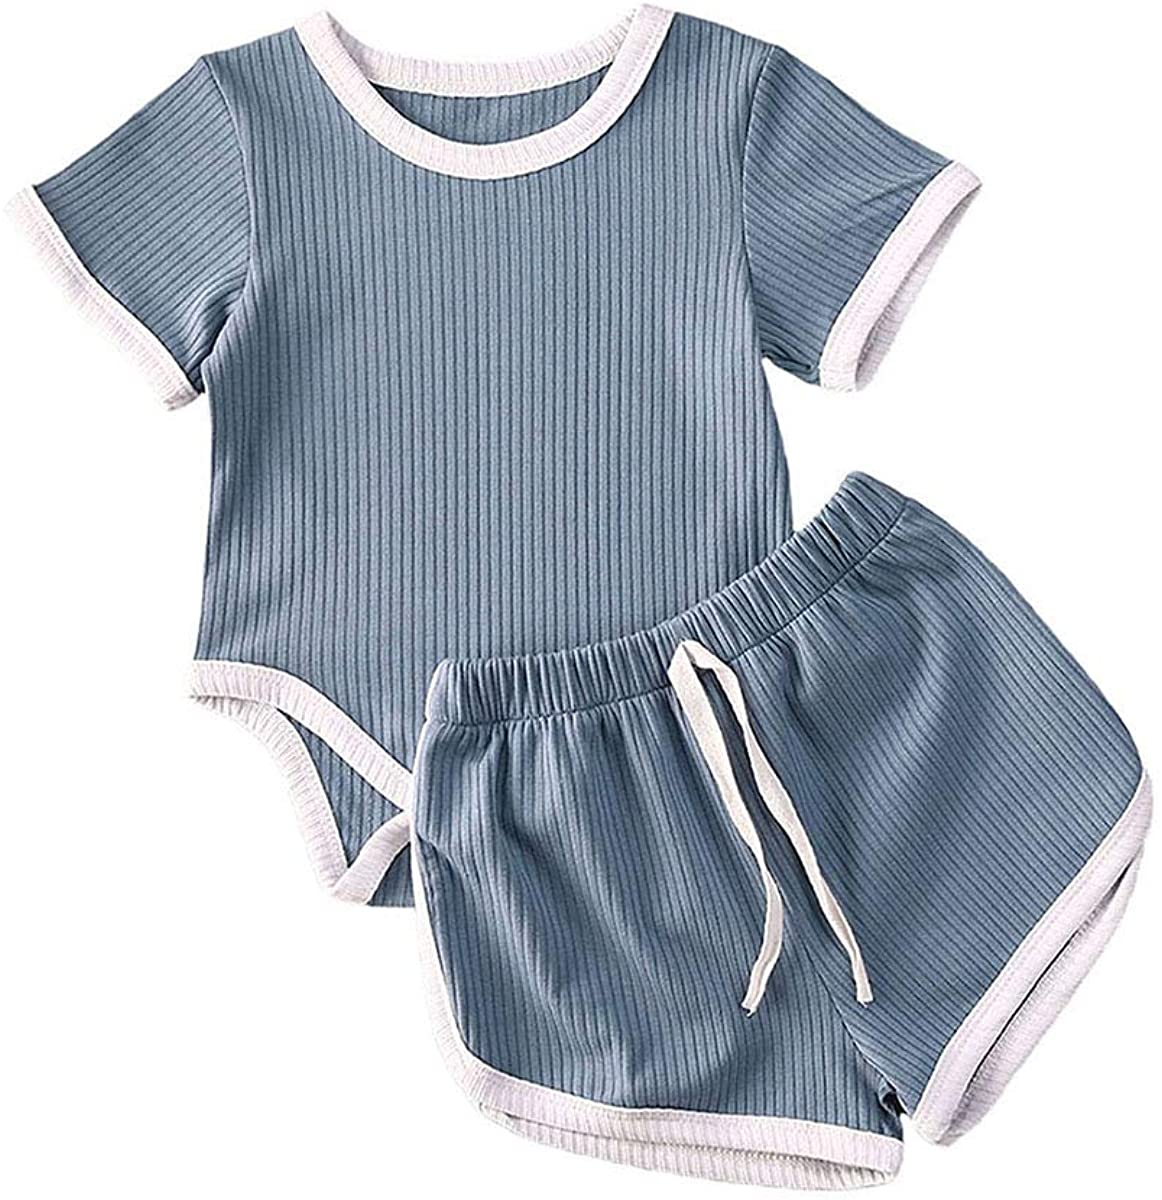 Newborn Baby Girls Summer Knit Outfits Set Toddler Girls Basic Romper Tops + Drawstring Shorts 2Pcs Clothes